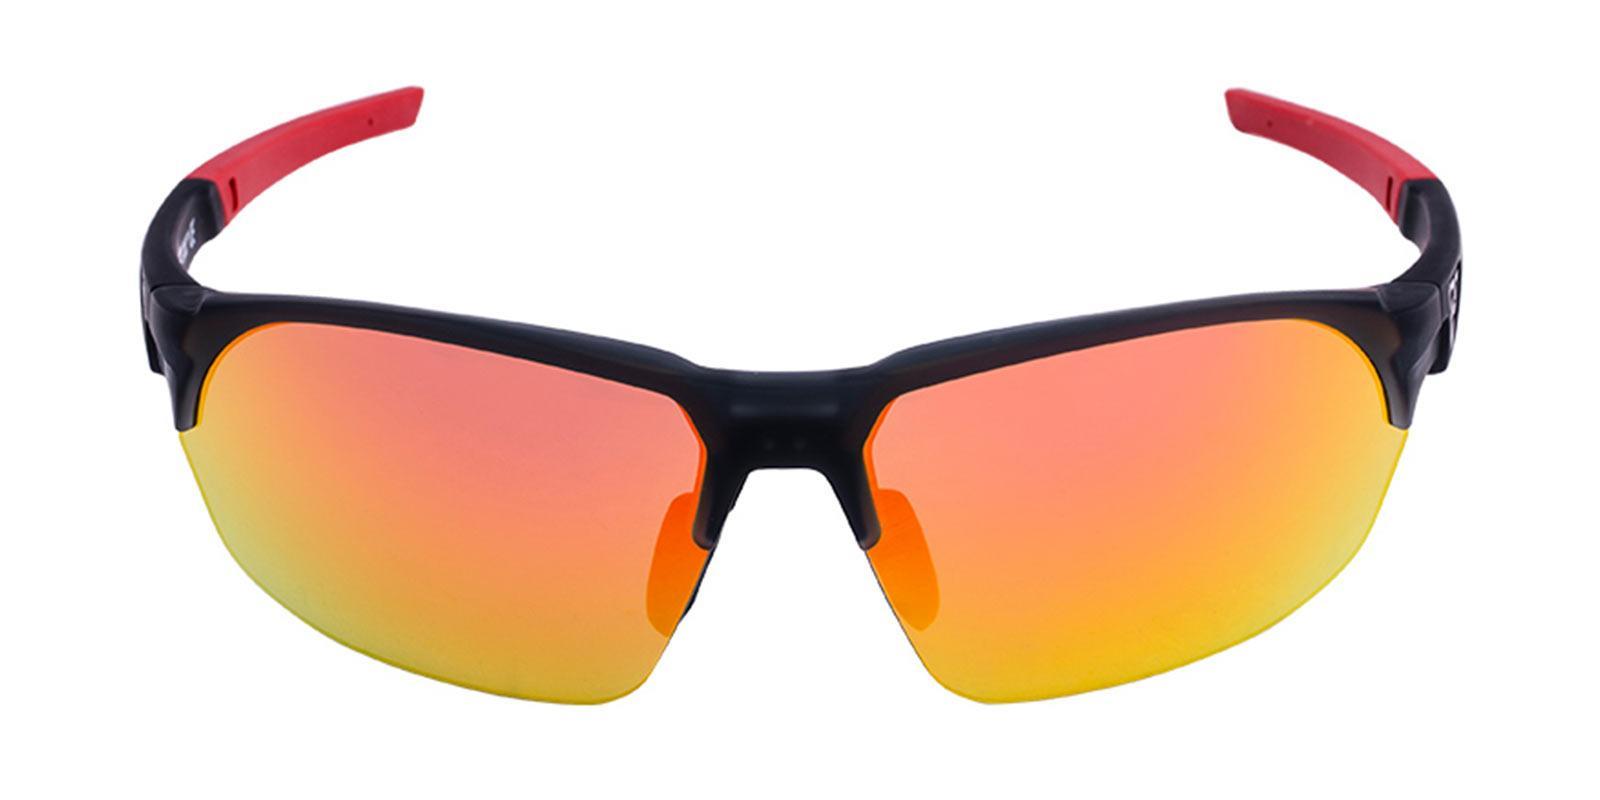 AltaB-Black-Geometric-Combination-SportsGlasses-detail